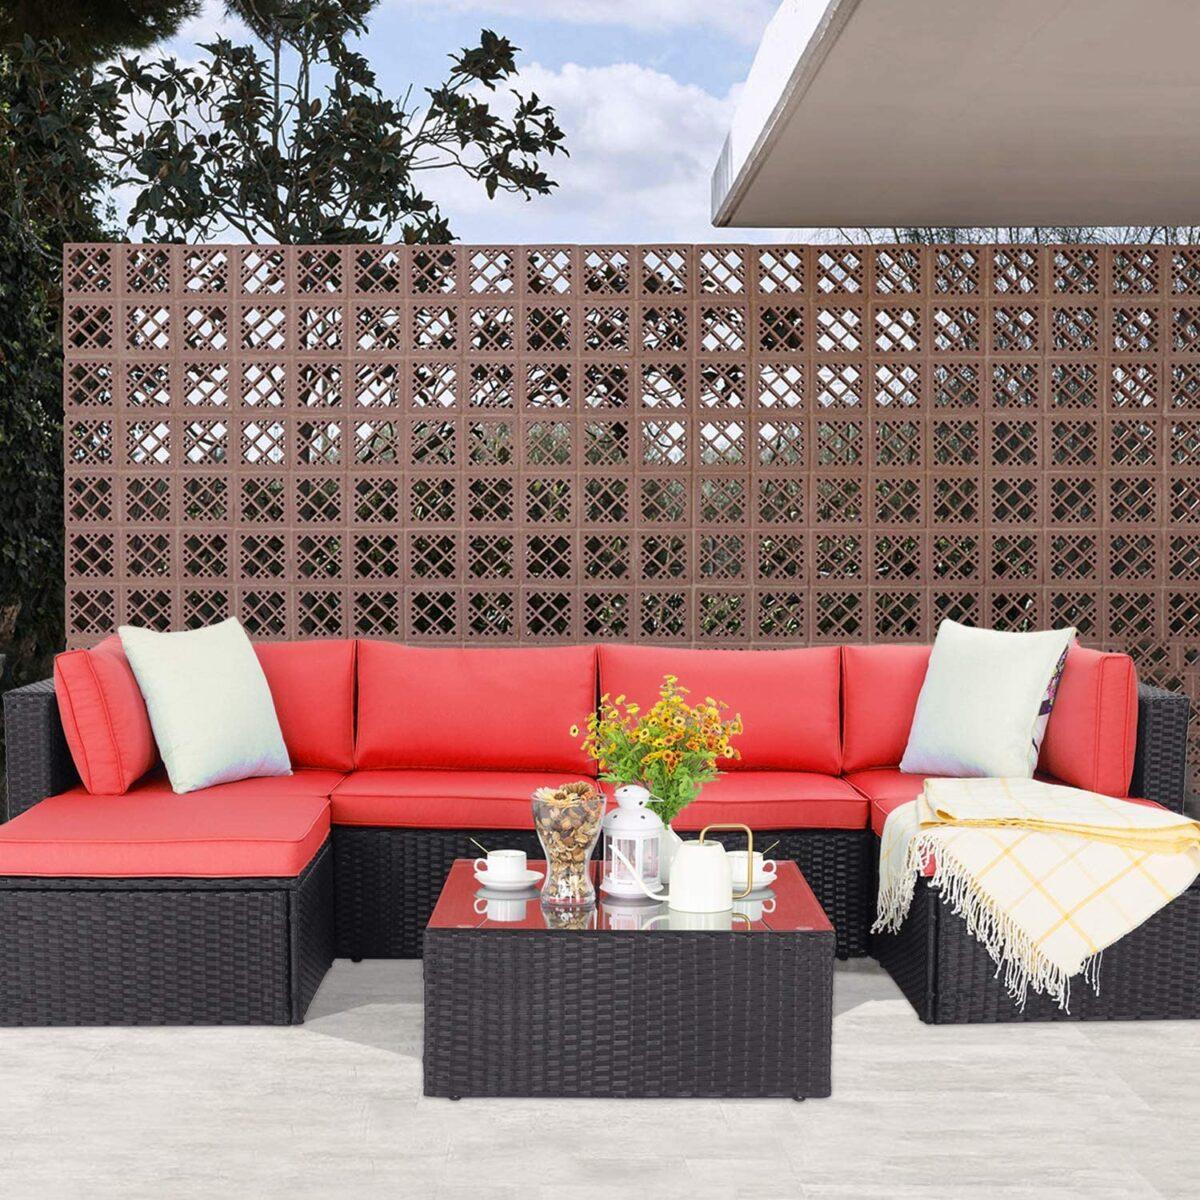 garden-furniture-trends-2021-11